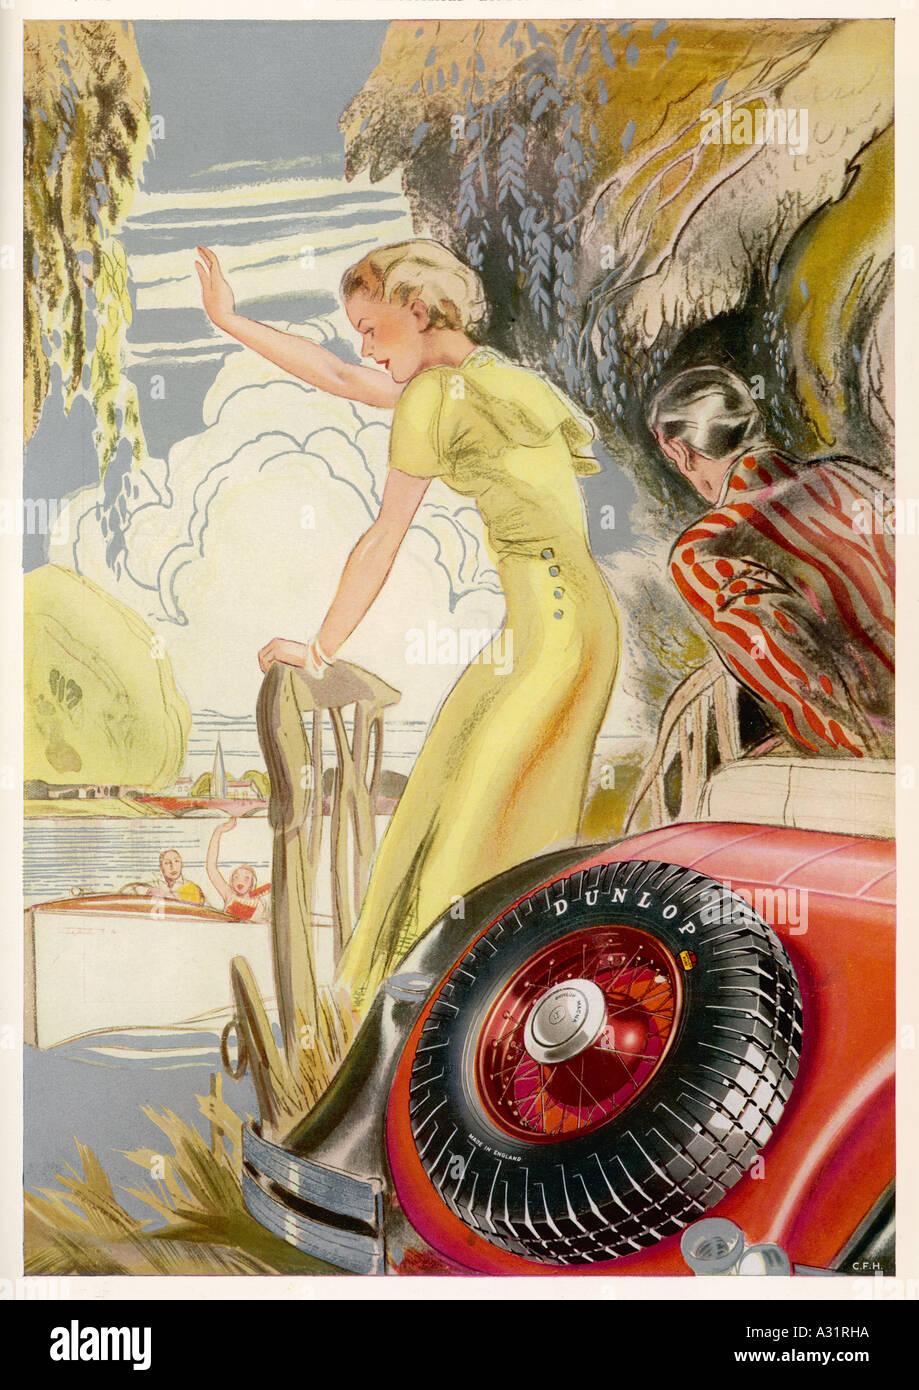 Annuncio pneumatici Dunlop 1934 Immagini Stock